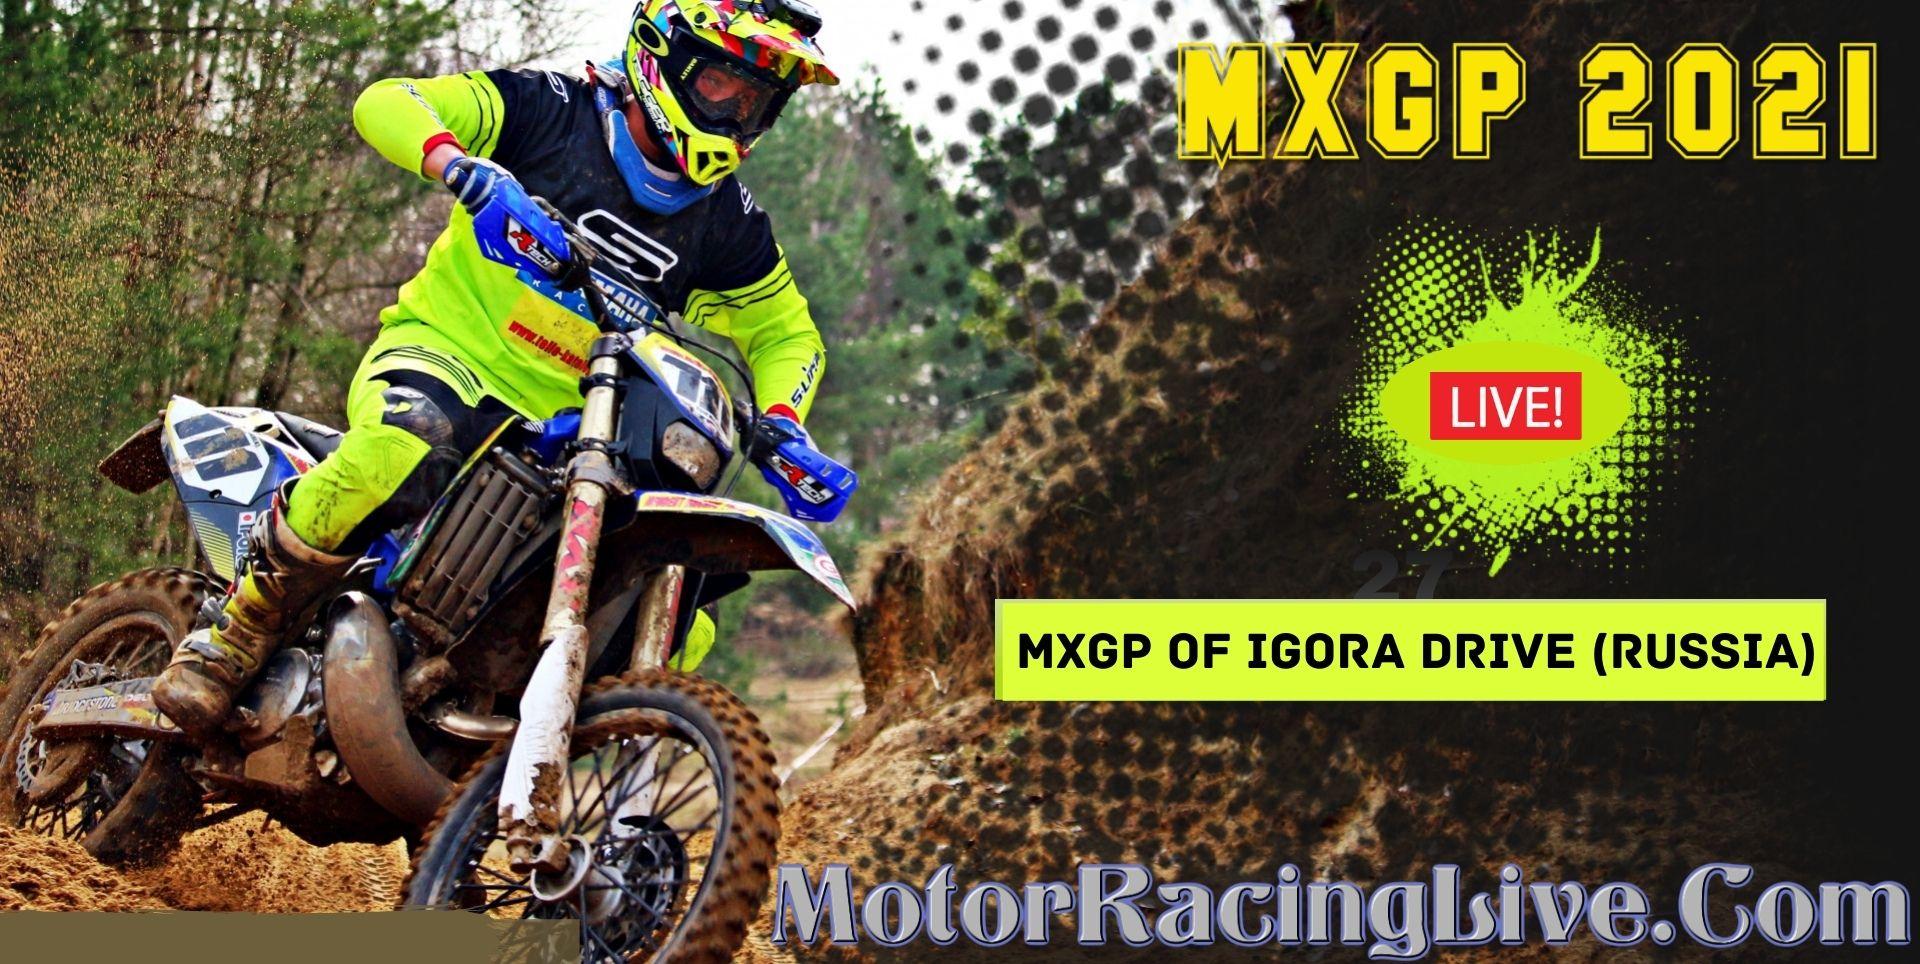 MXGP OF IGORA DRIVE (RUSSIA) 2021 Live Stream